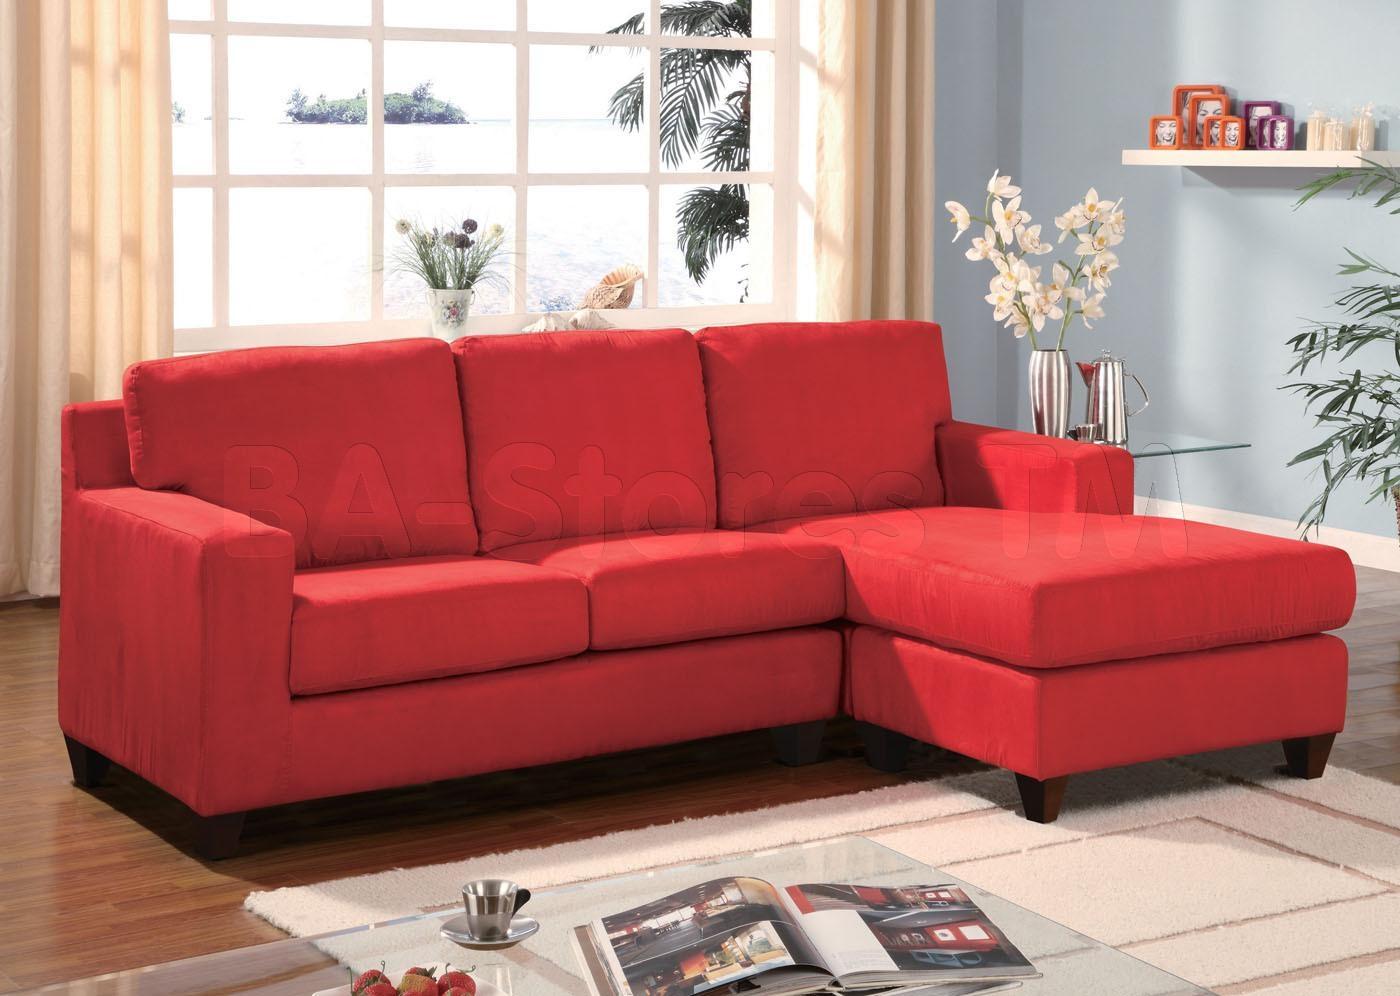 Red Sectional Sofa Microfiber | Centerfieldbar In Red Microfiber Sectional Sofas (View 2 of 21)